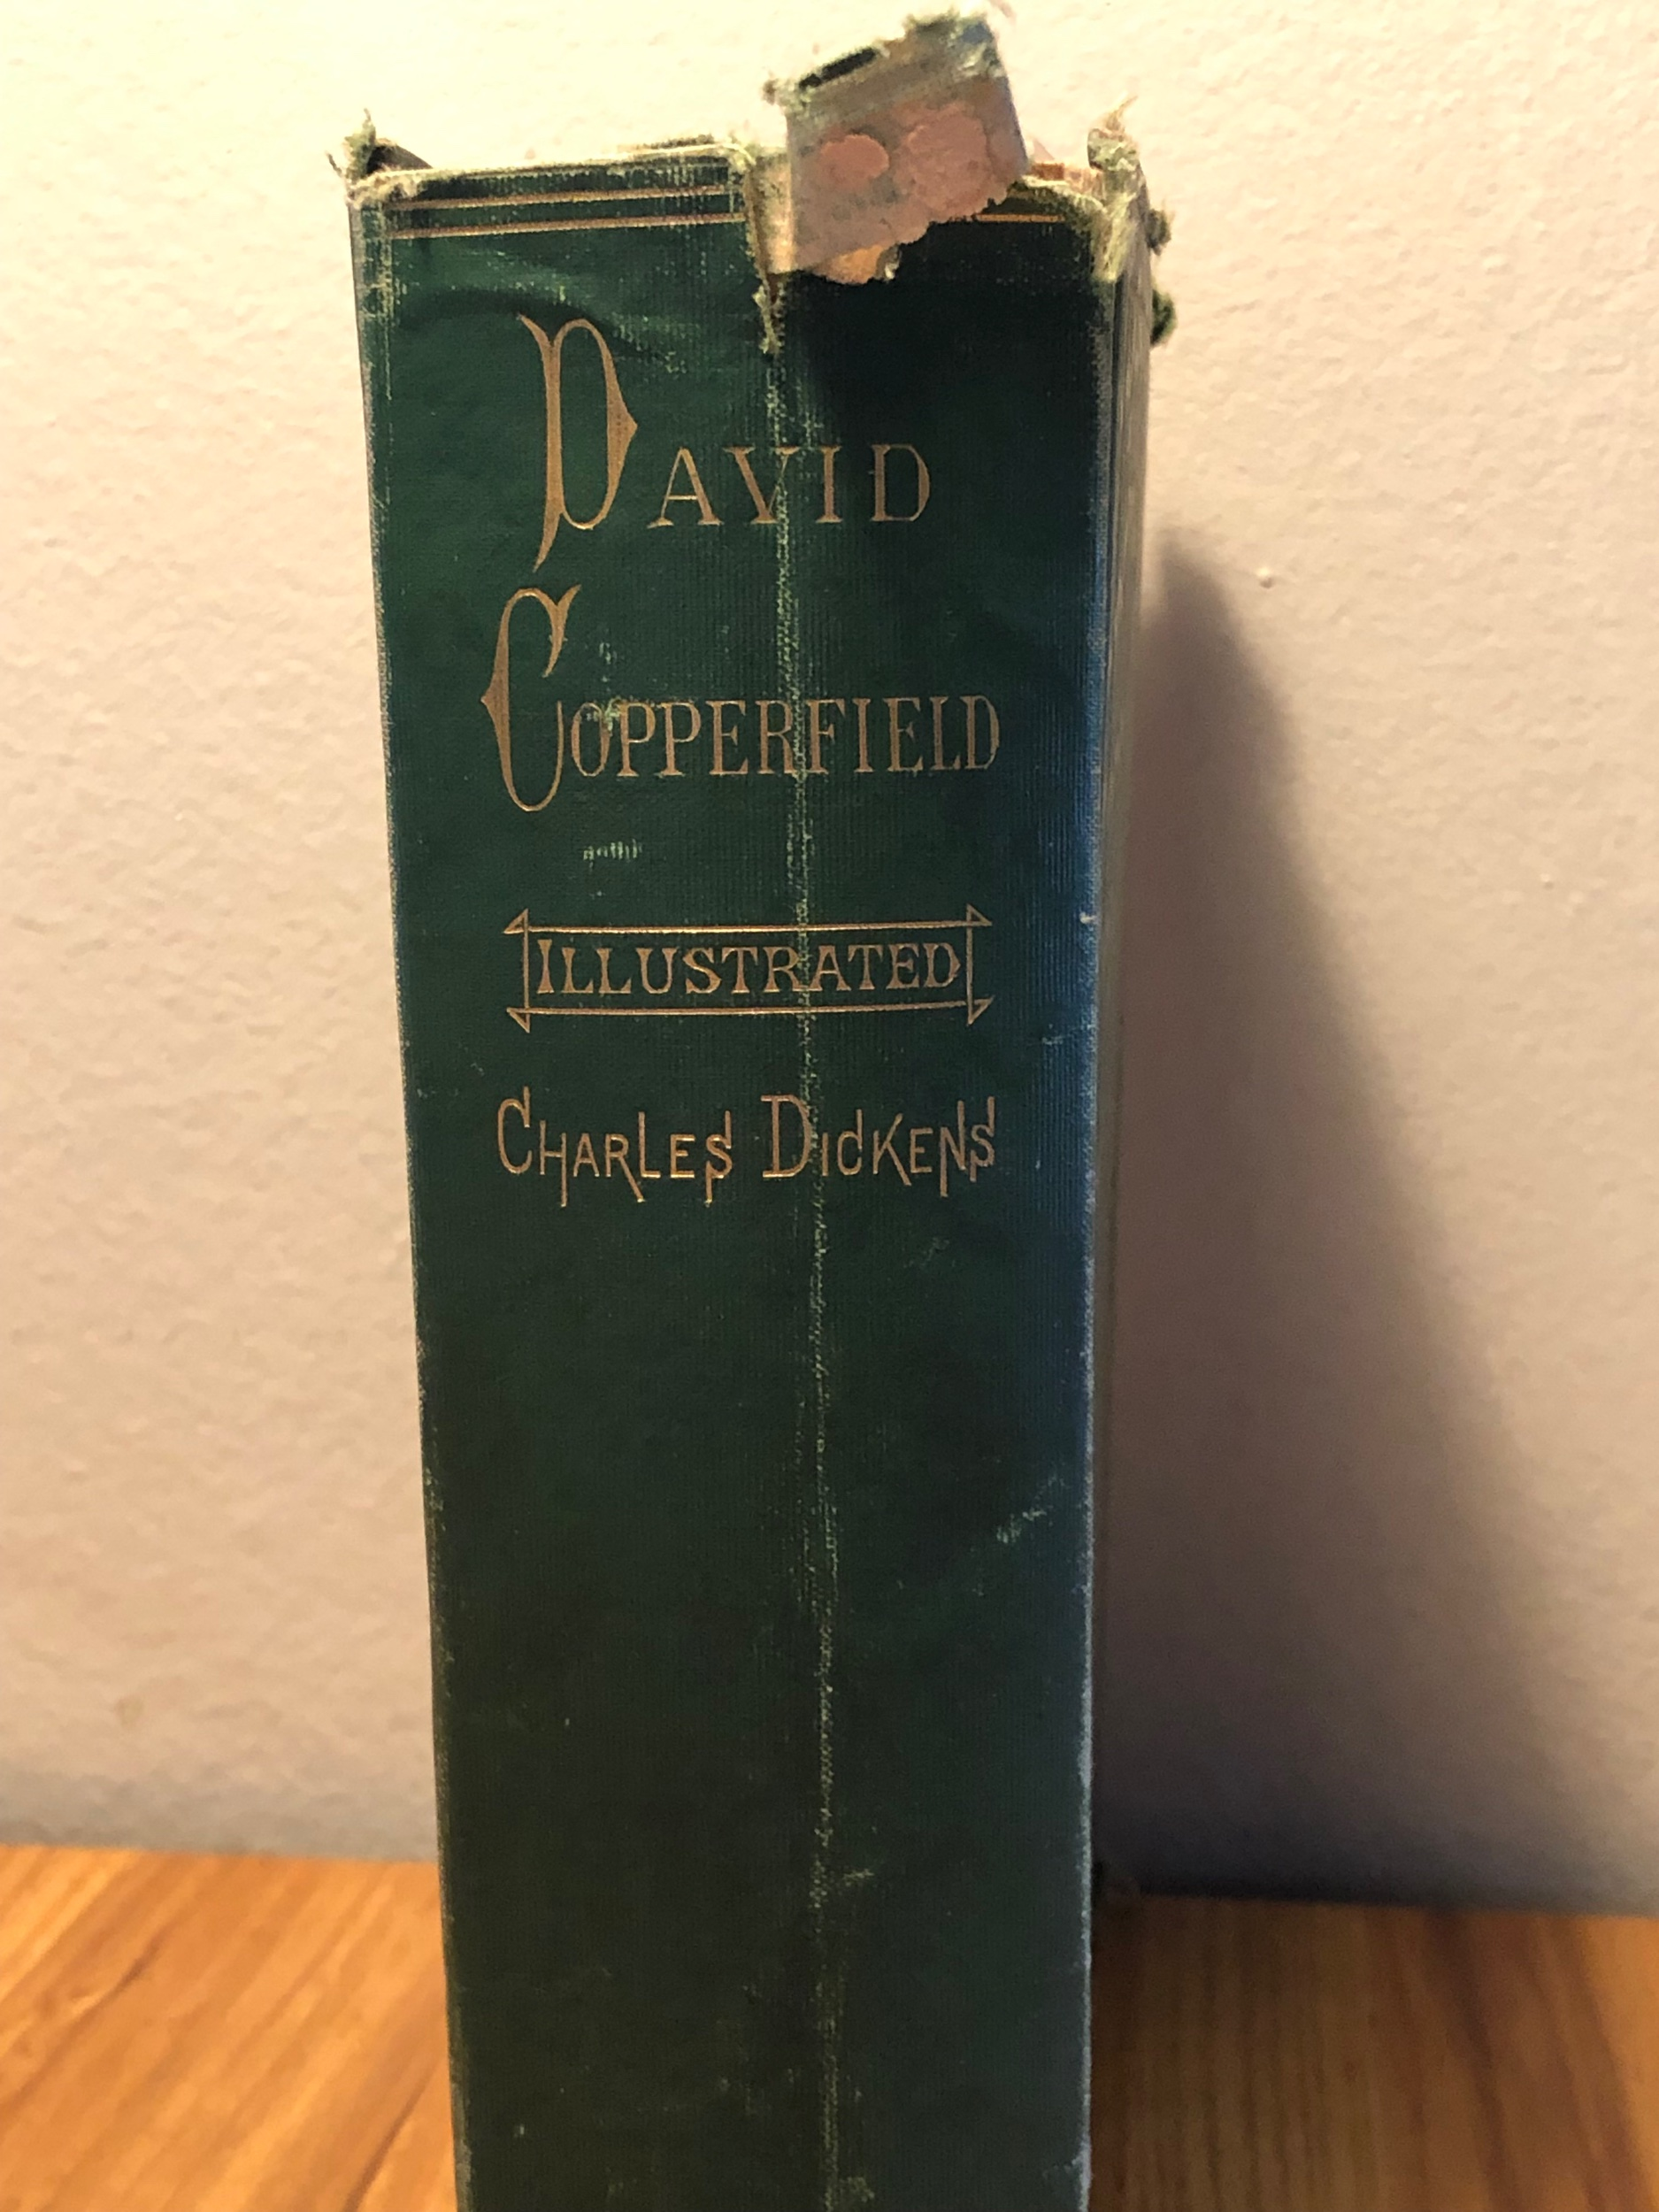 DAVID COPPERFIELDBY CHALRES DICKNS -